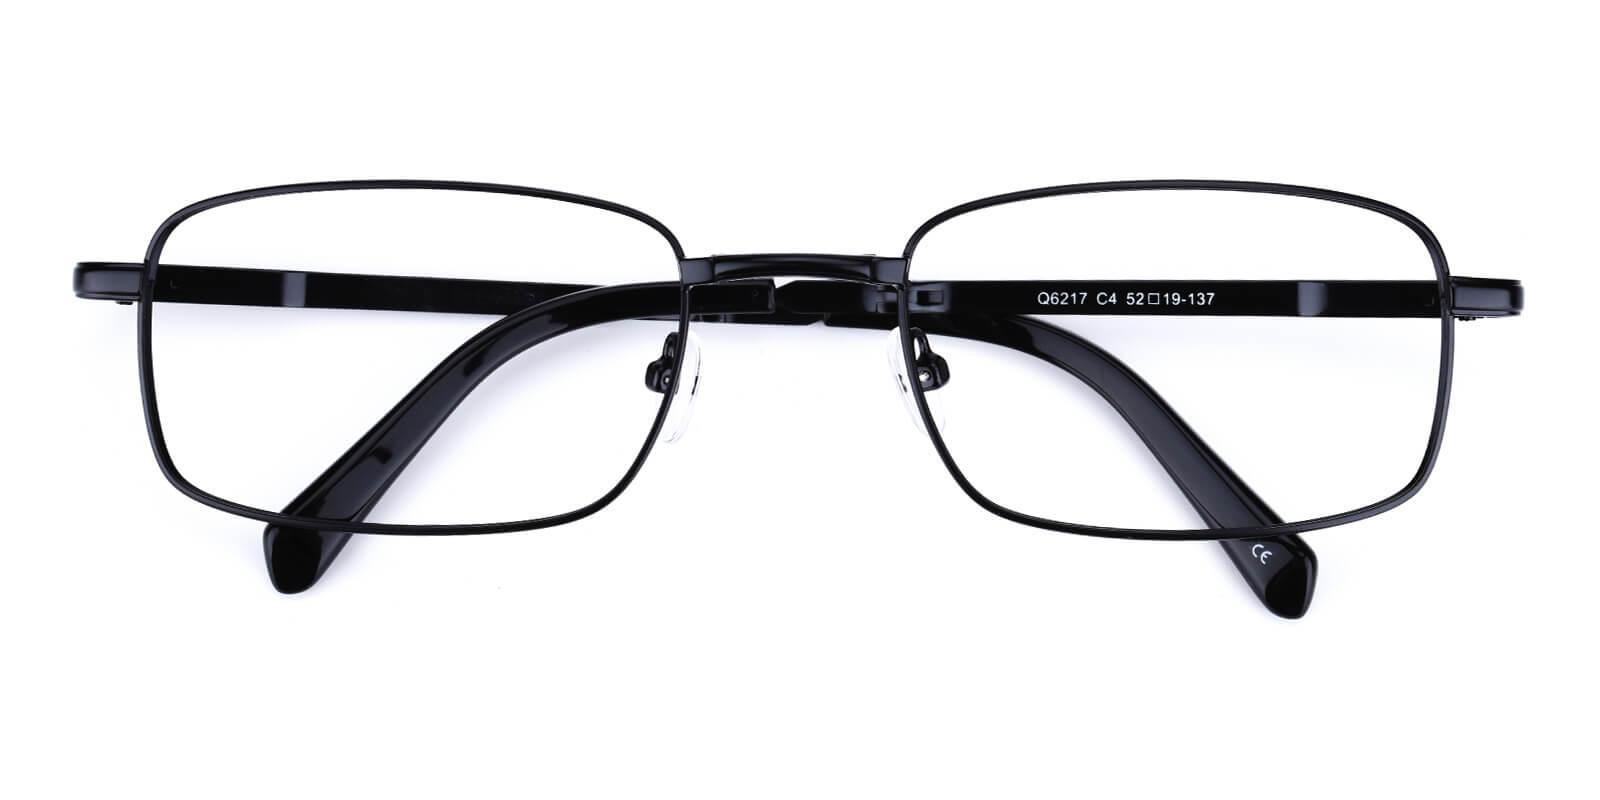 Norfolk-Black-Rectangle-Metal-Eyeglasses-detail